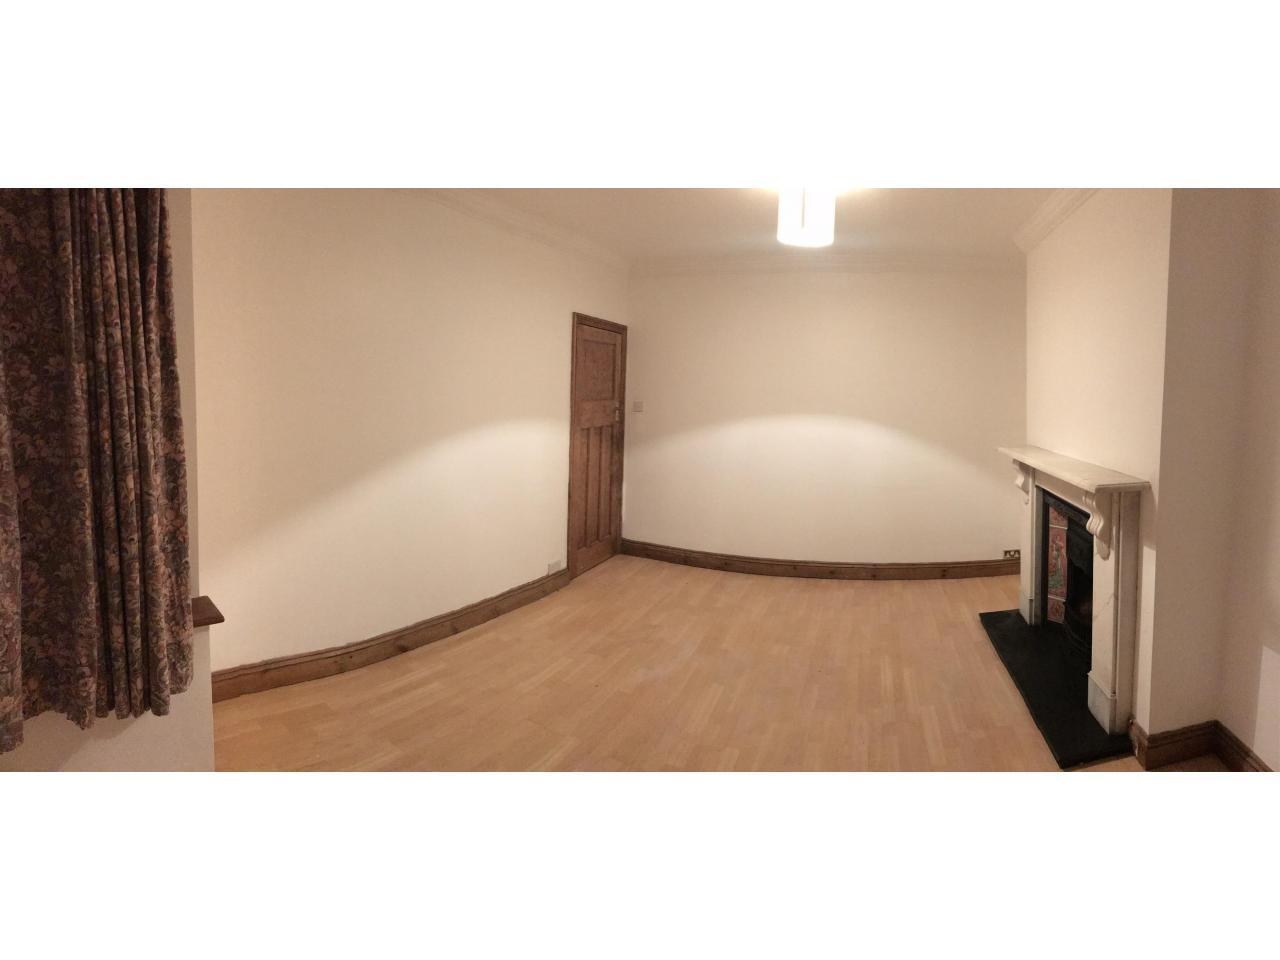 Сингл и Дабл комнаты в аренду на Neasden / Sudbury Hill / Harrow / Greenford. - 5